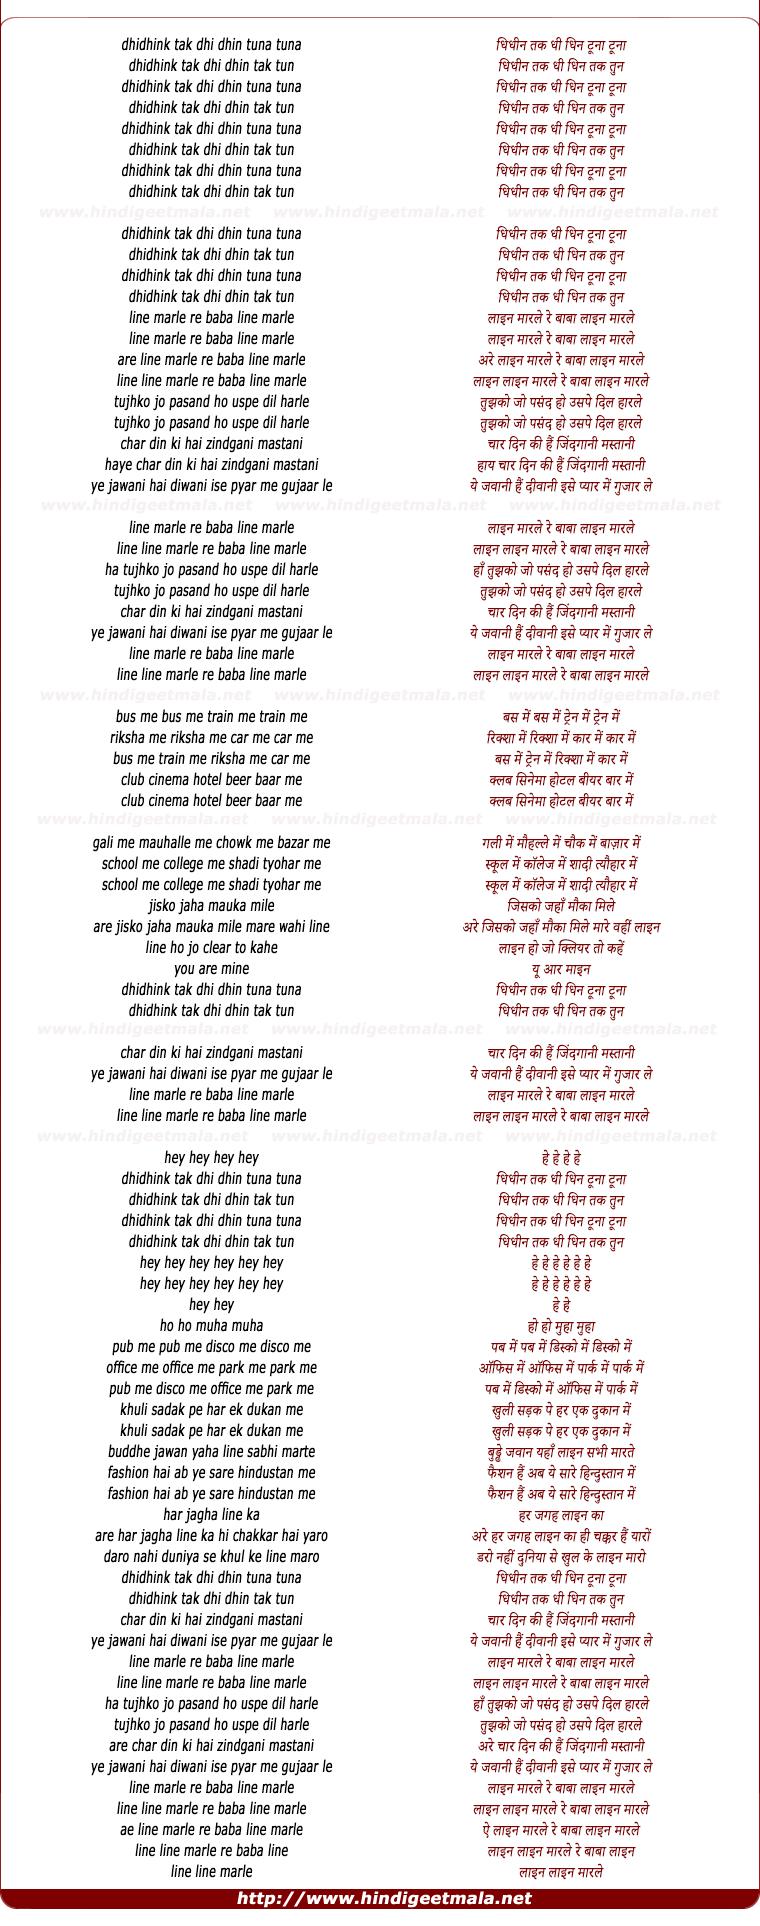 lyrics of song Line Marle Re Baba Line Marle